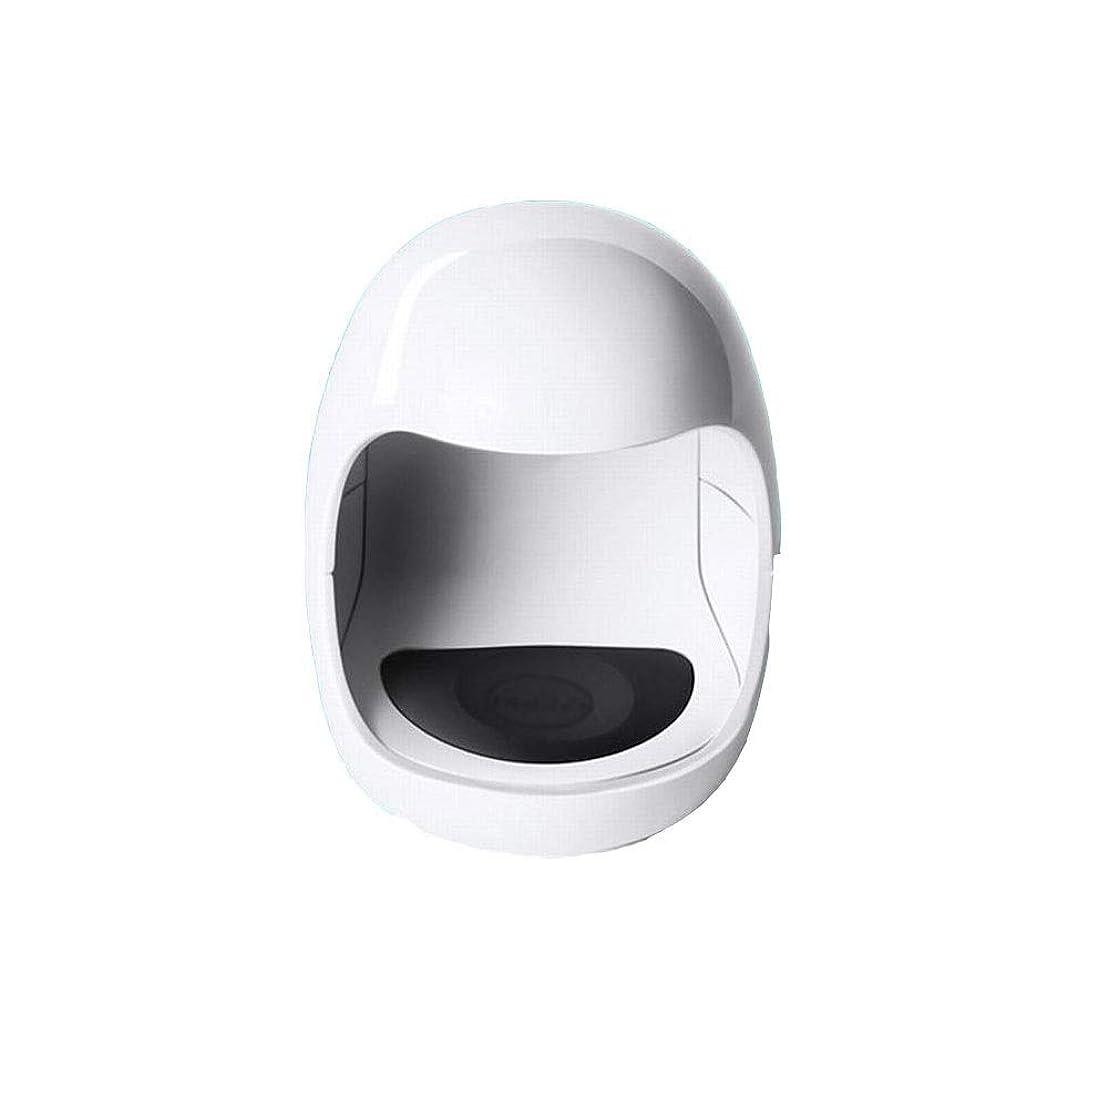 YESONEEP ミニ光線療法機ミニシングルフィンガーネイルライトセラピーライトUSB日光LED速乾性ネイルオイルグルーベーキングランプ (色 : White)